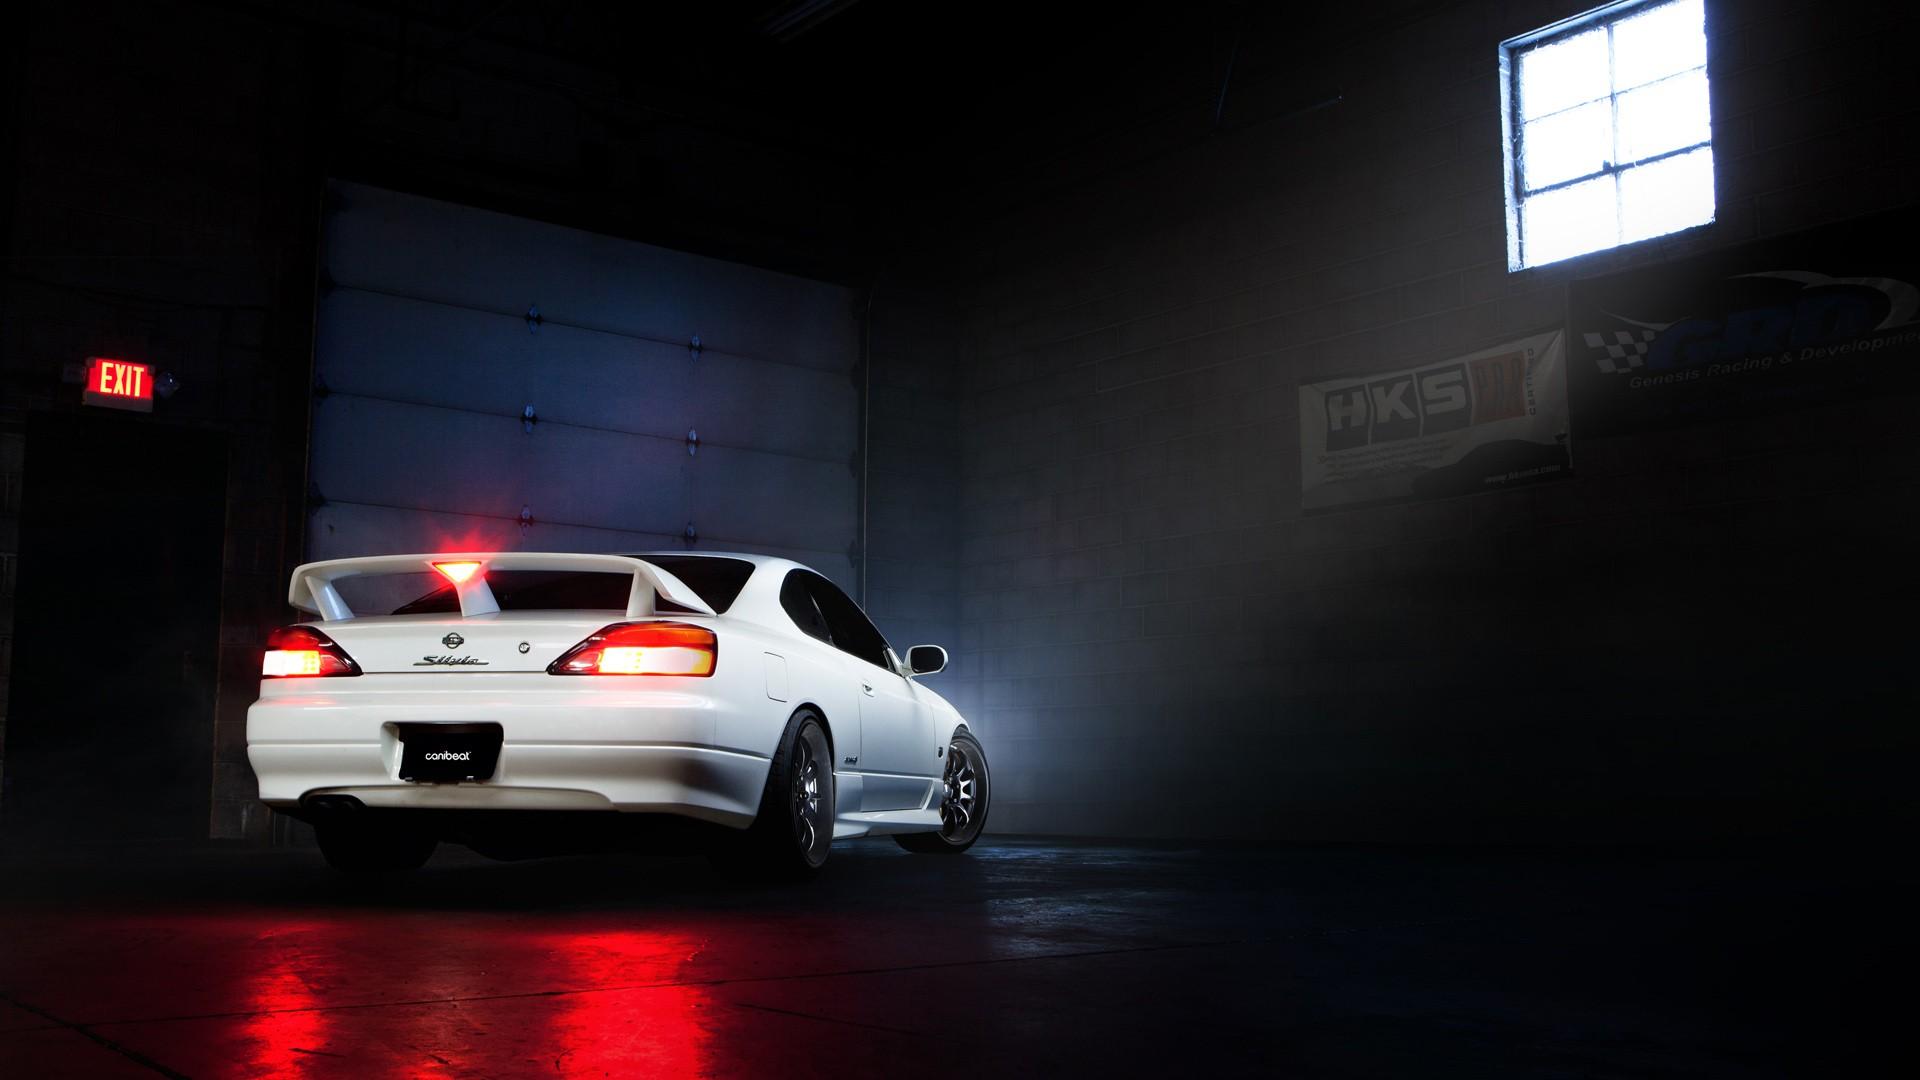 1920x1080 Px Car JDM Nissan S15 Silvia Silvia S15